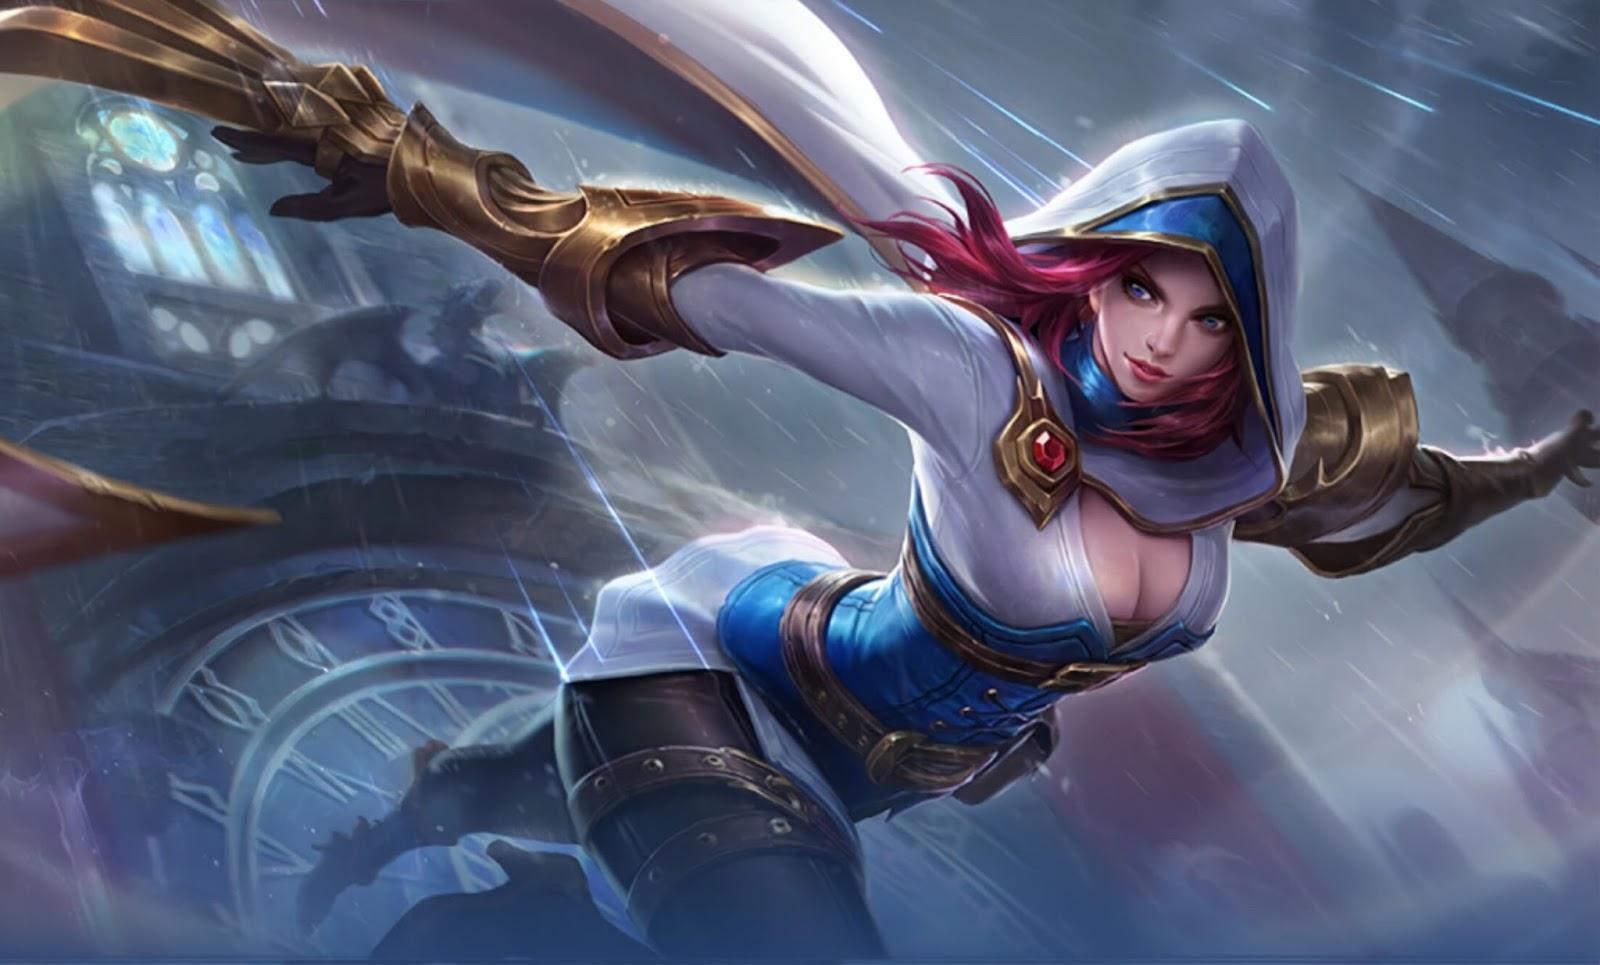 Wallpaper Natalia Bright Claw Mobile Legends Full HD for PC